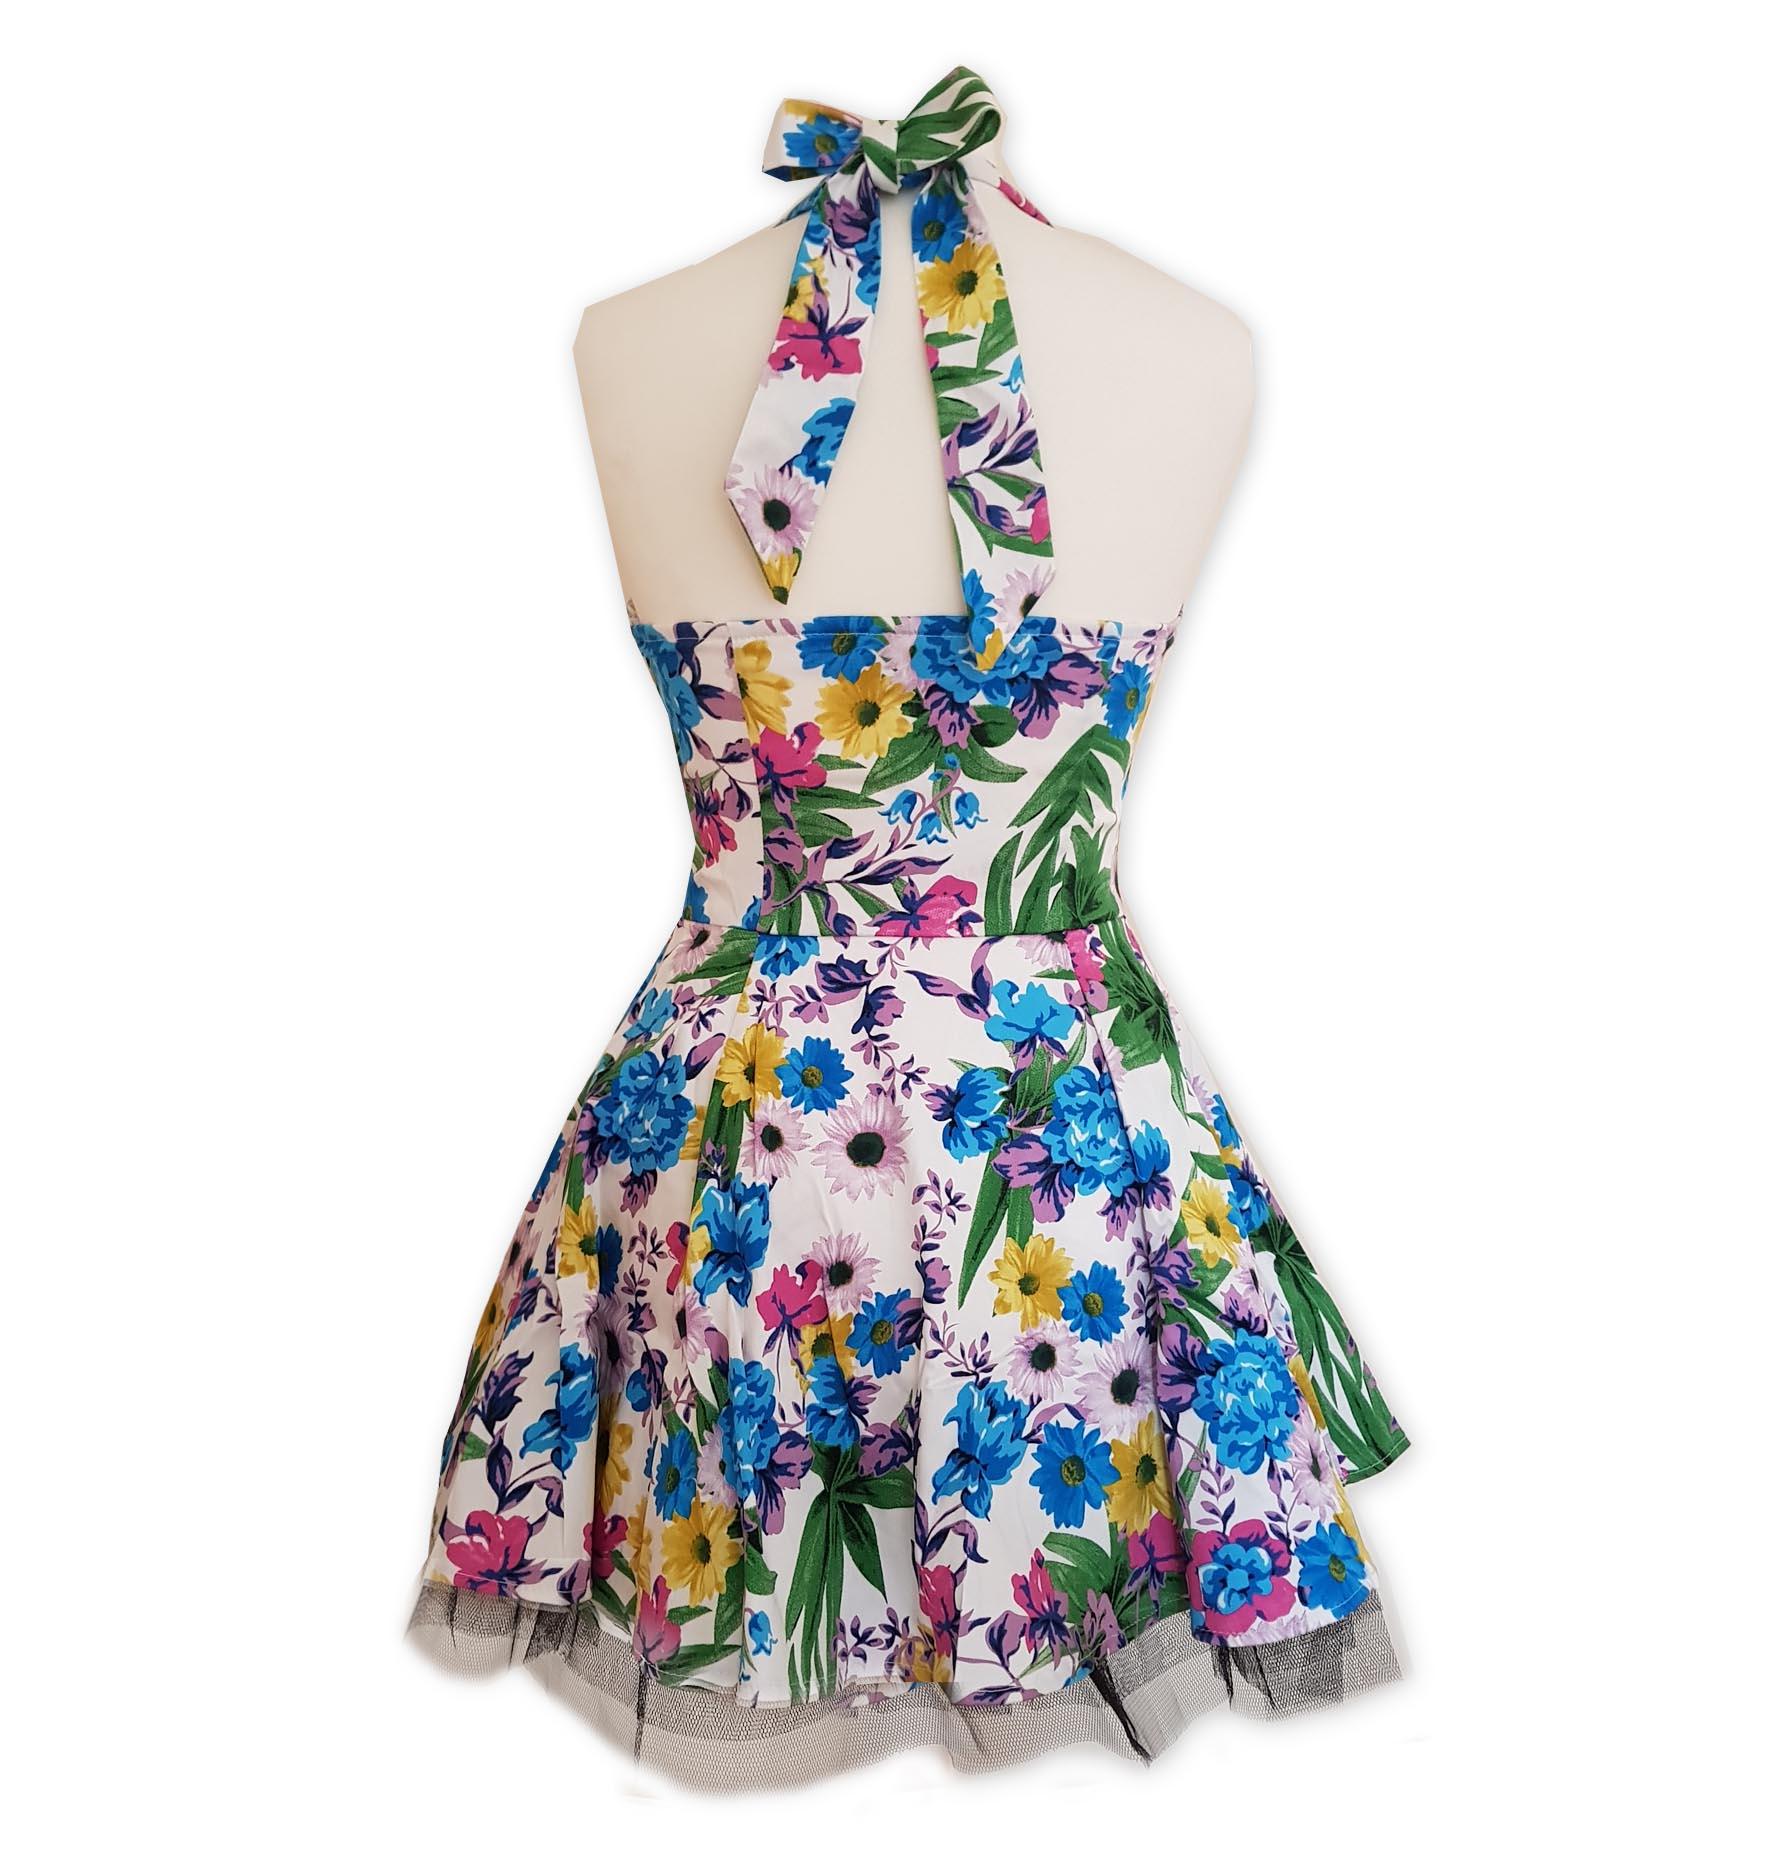 H-amp-R-Hearts-amp-Roses-London-White-Mini-Dress-039-Summer-Day-039-Flowers-All-Sizes thumbnail 13